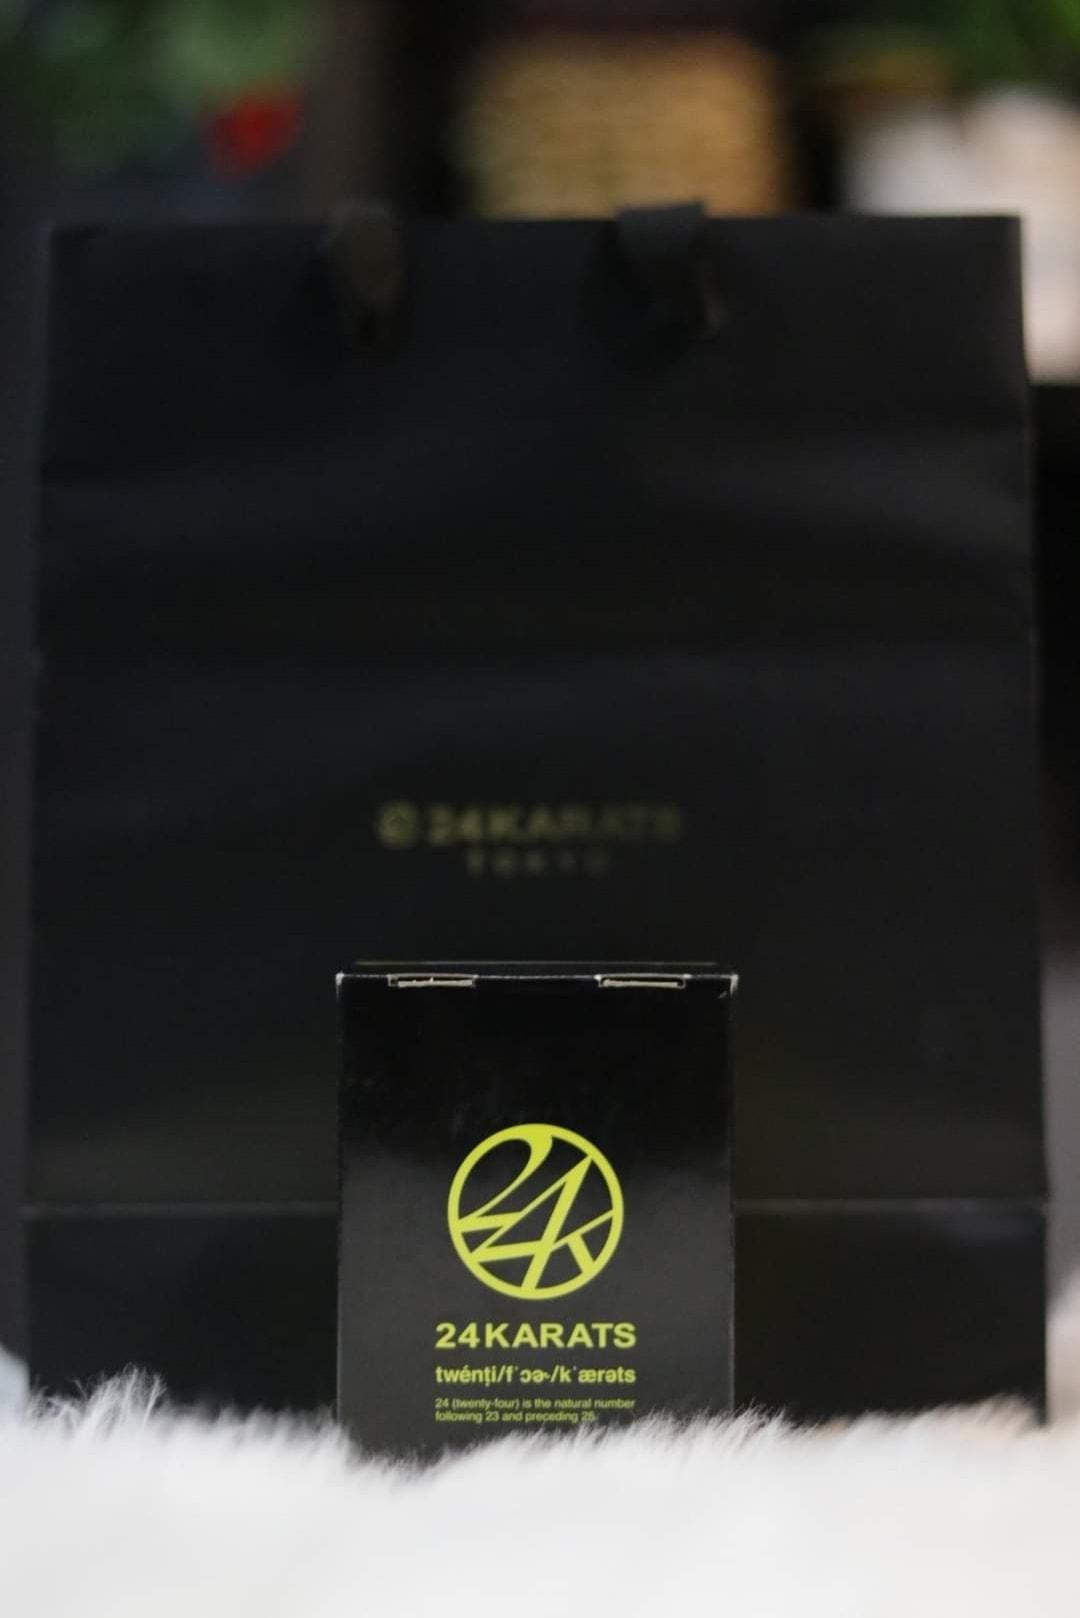 NOS 12 anniversary 24 karat DW-6900 (yellow)  Retail price 1600 x caya tryla goo…